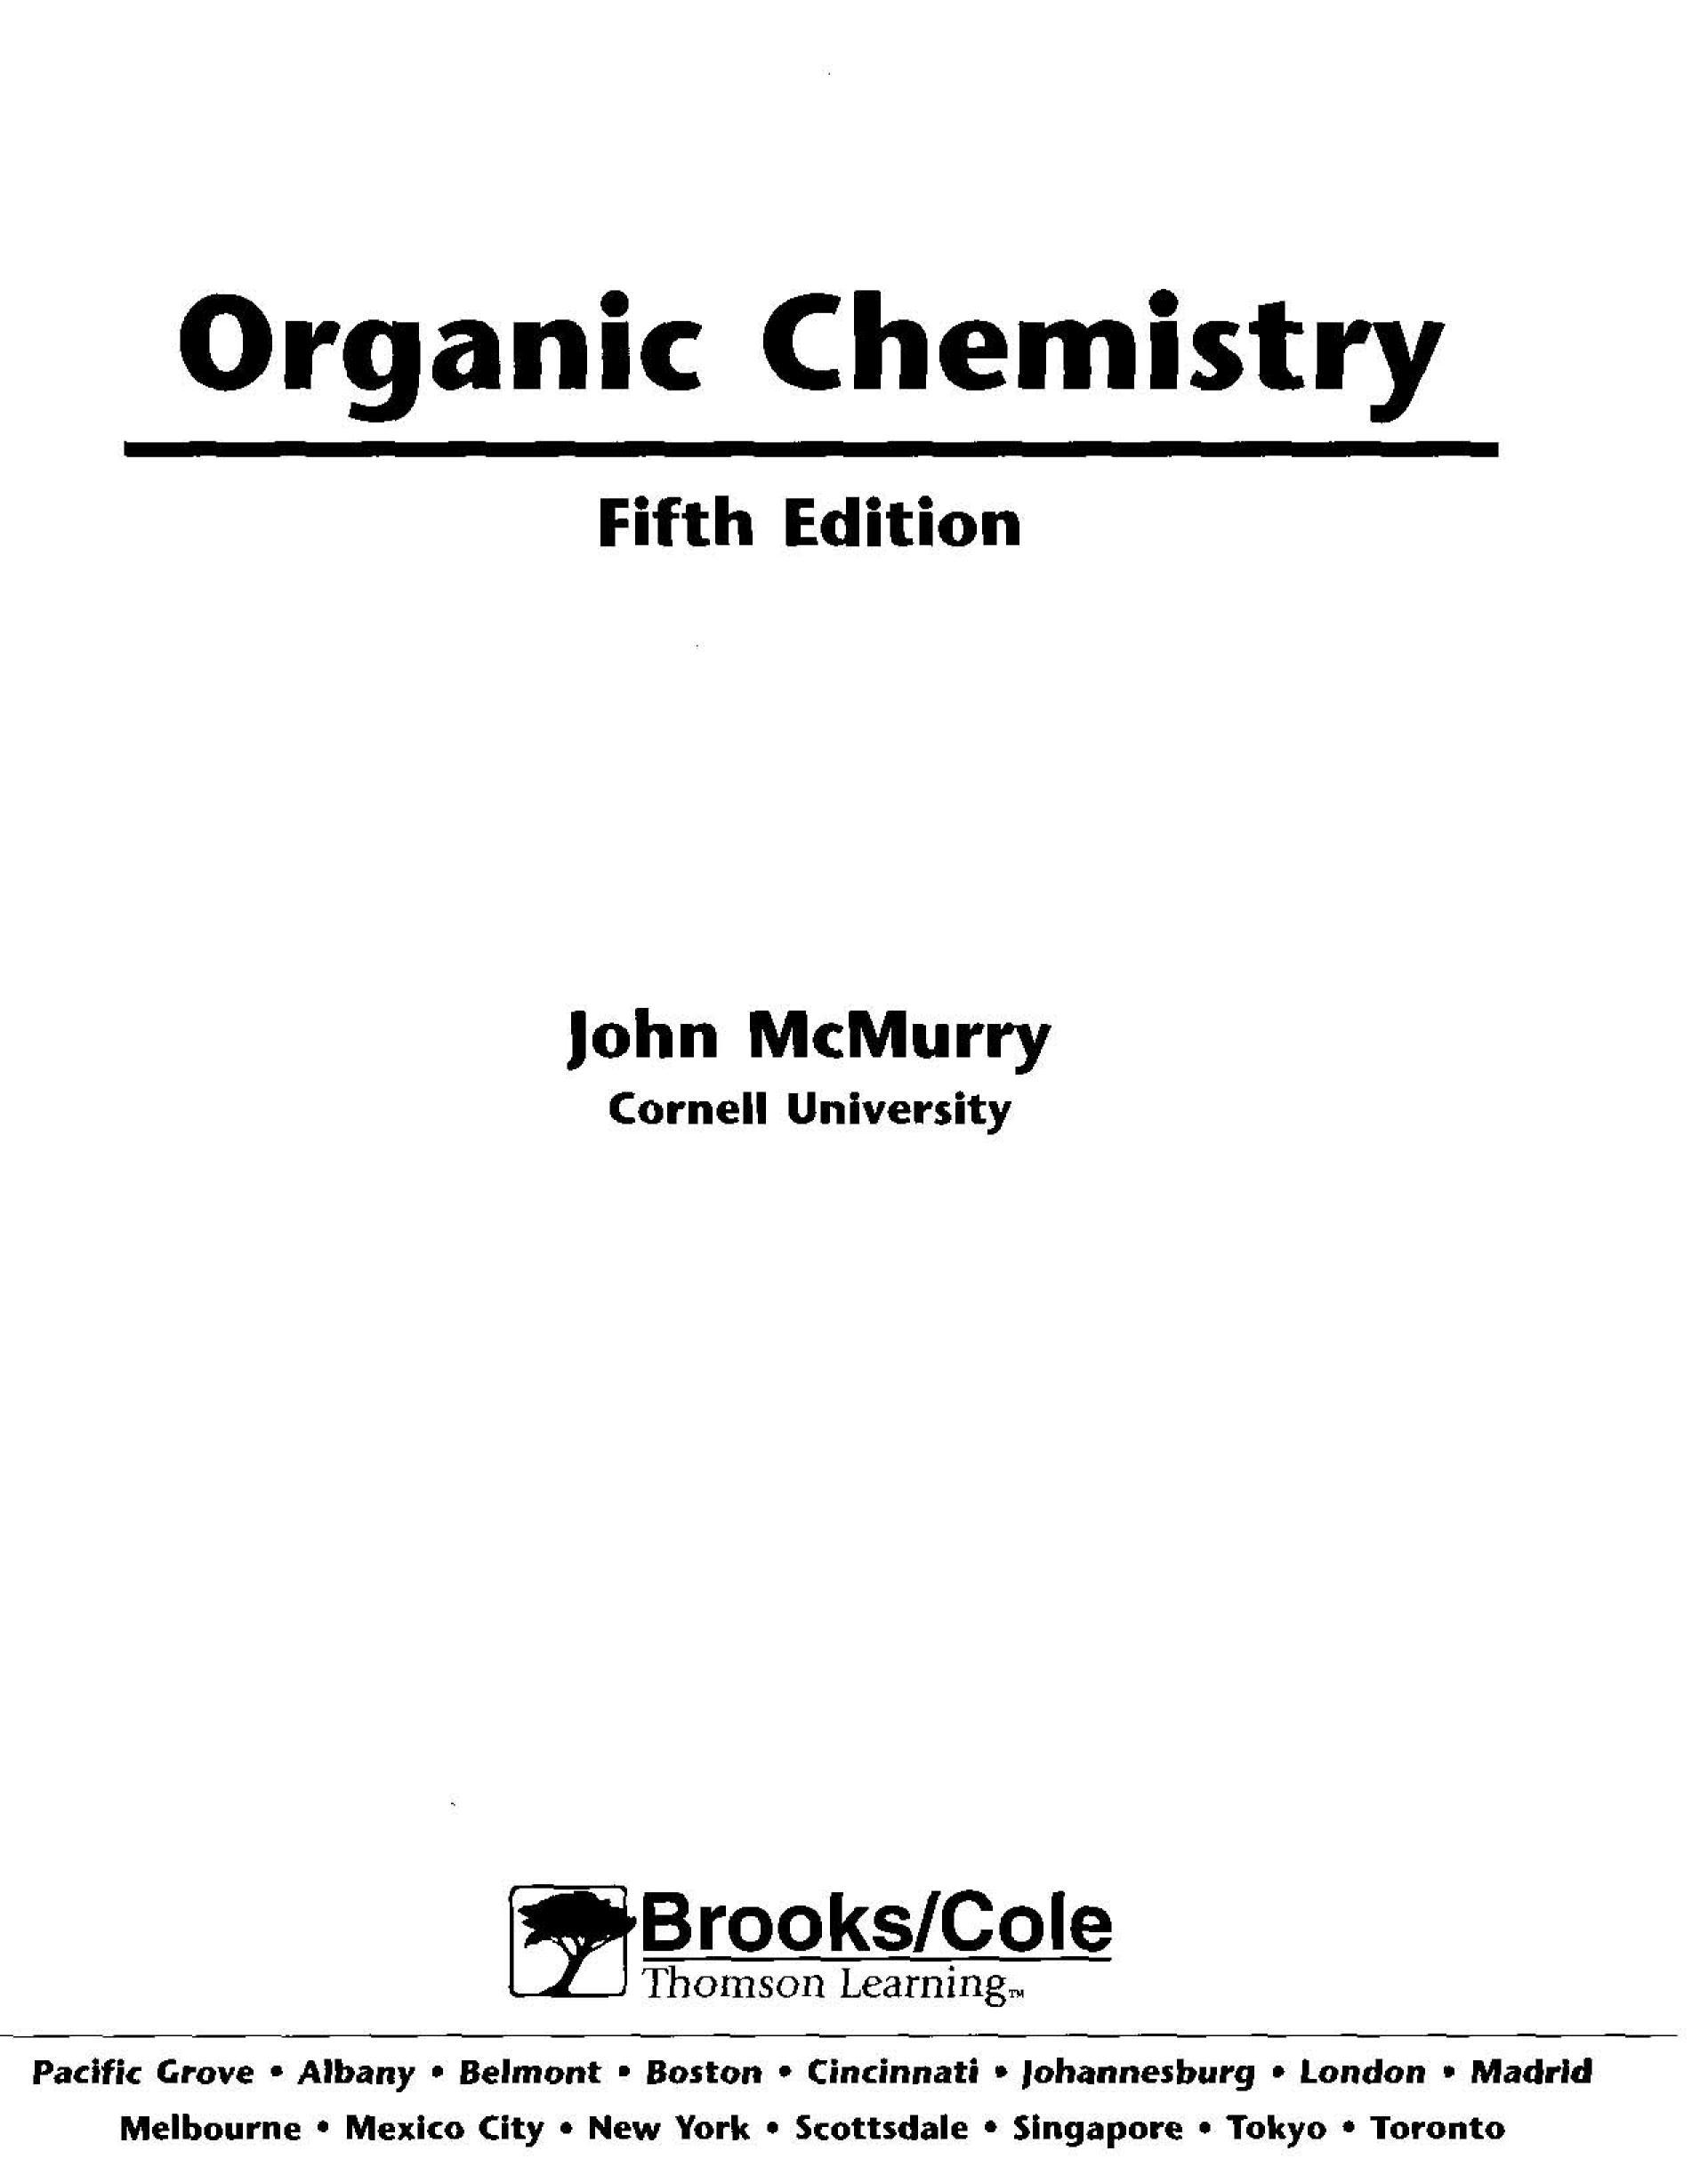 Kimia download kuantitatif ebook analisis